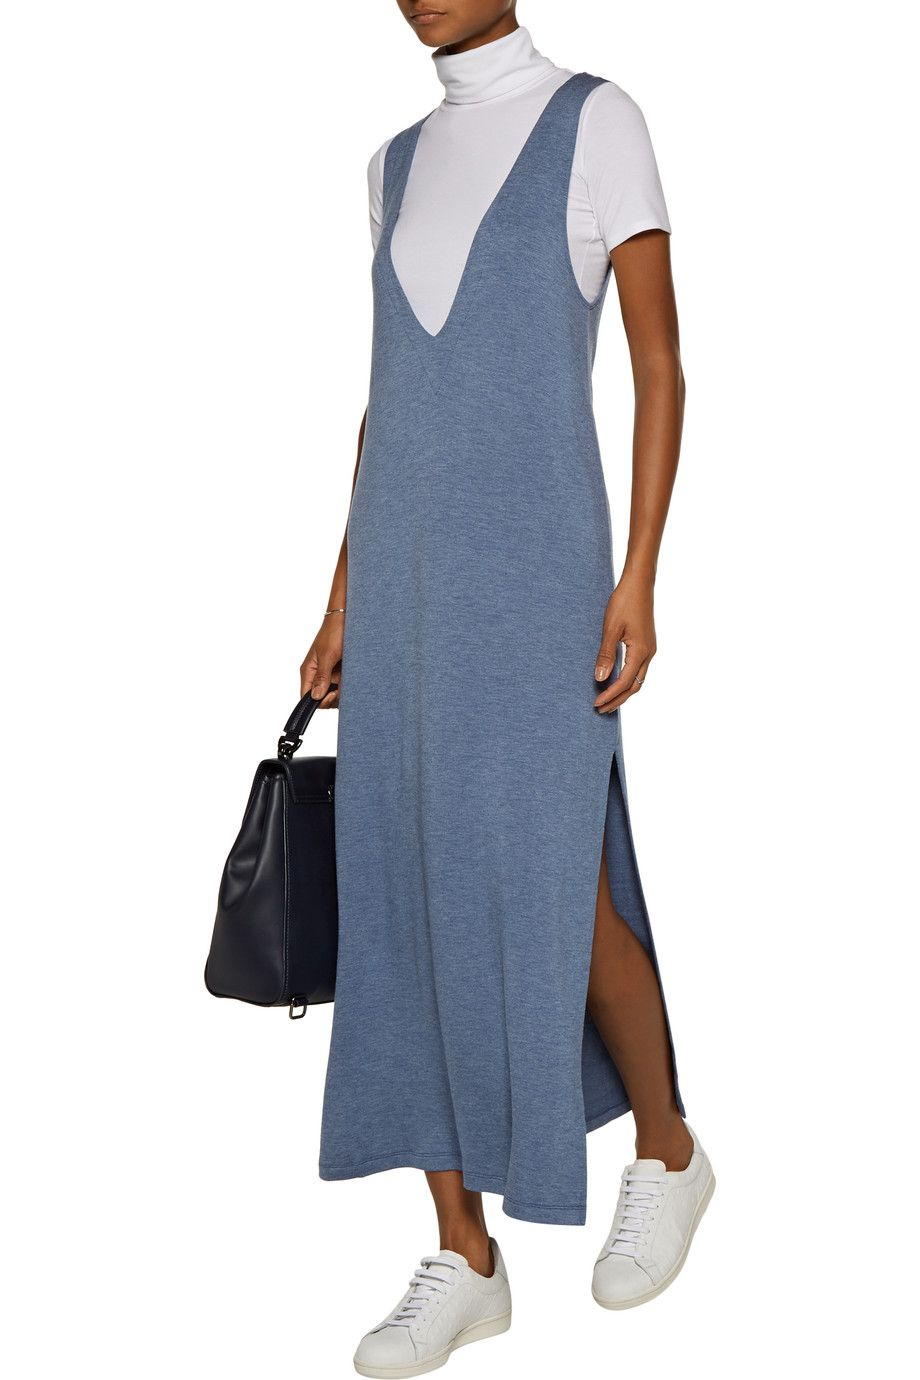 Stretch-jersey maxi dress | LNA | US | THE OUTNET